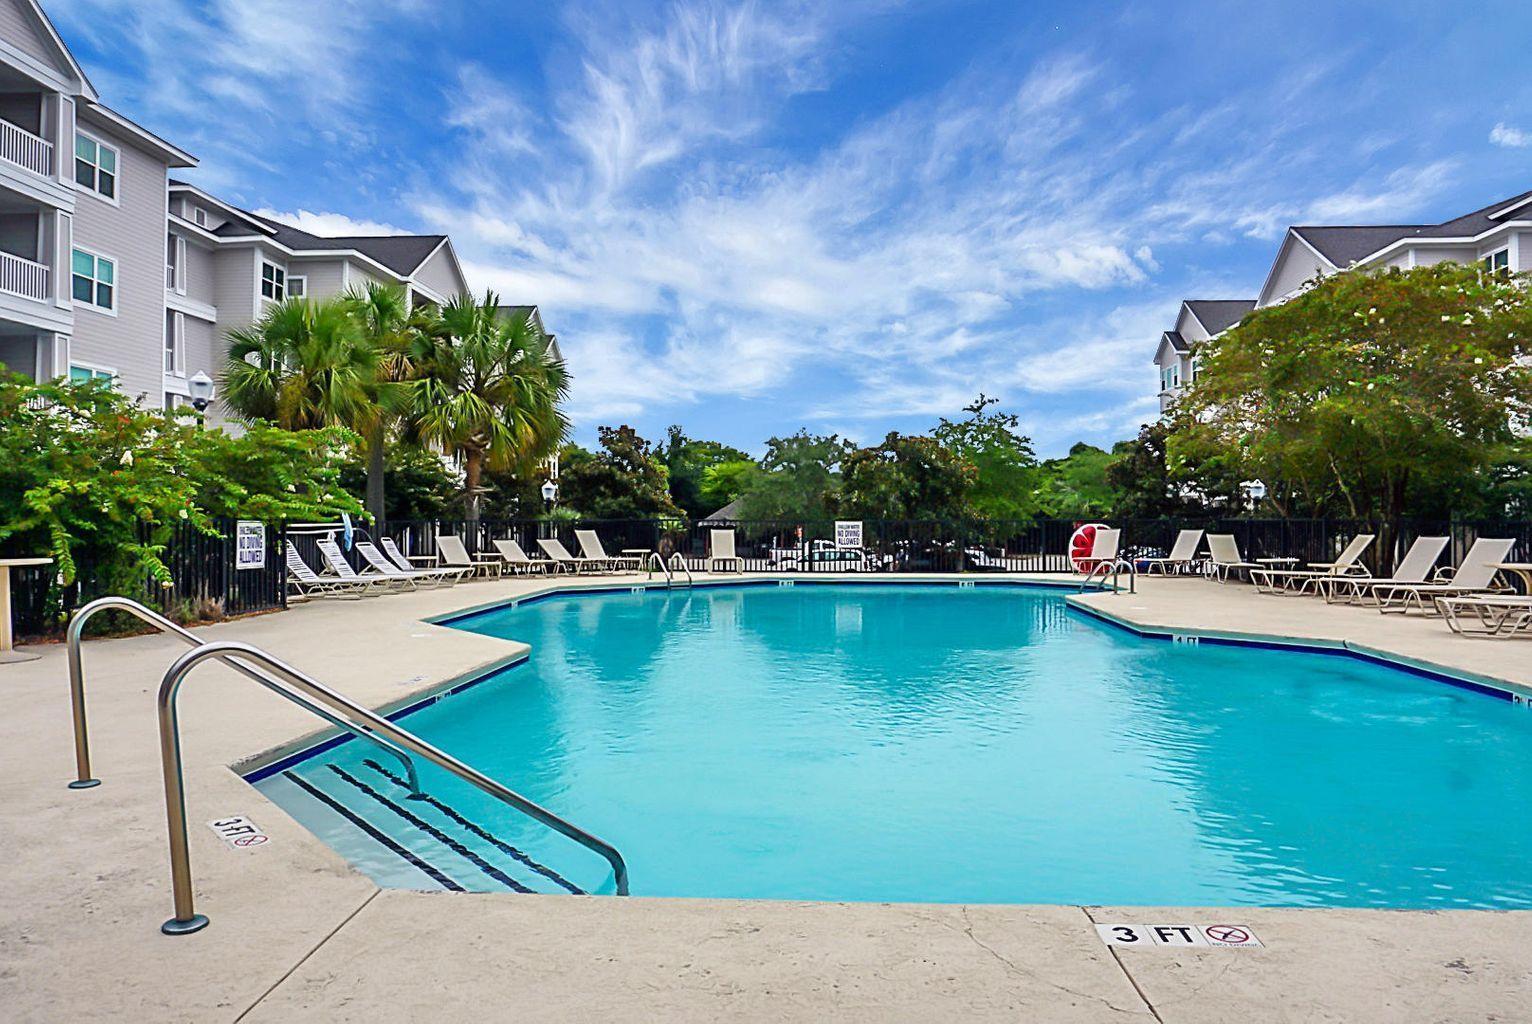 Pelican Pointe Villas Homes For Sale - 1984 Folly, Charleston, SC - 10